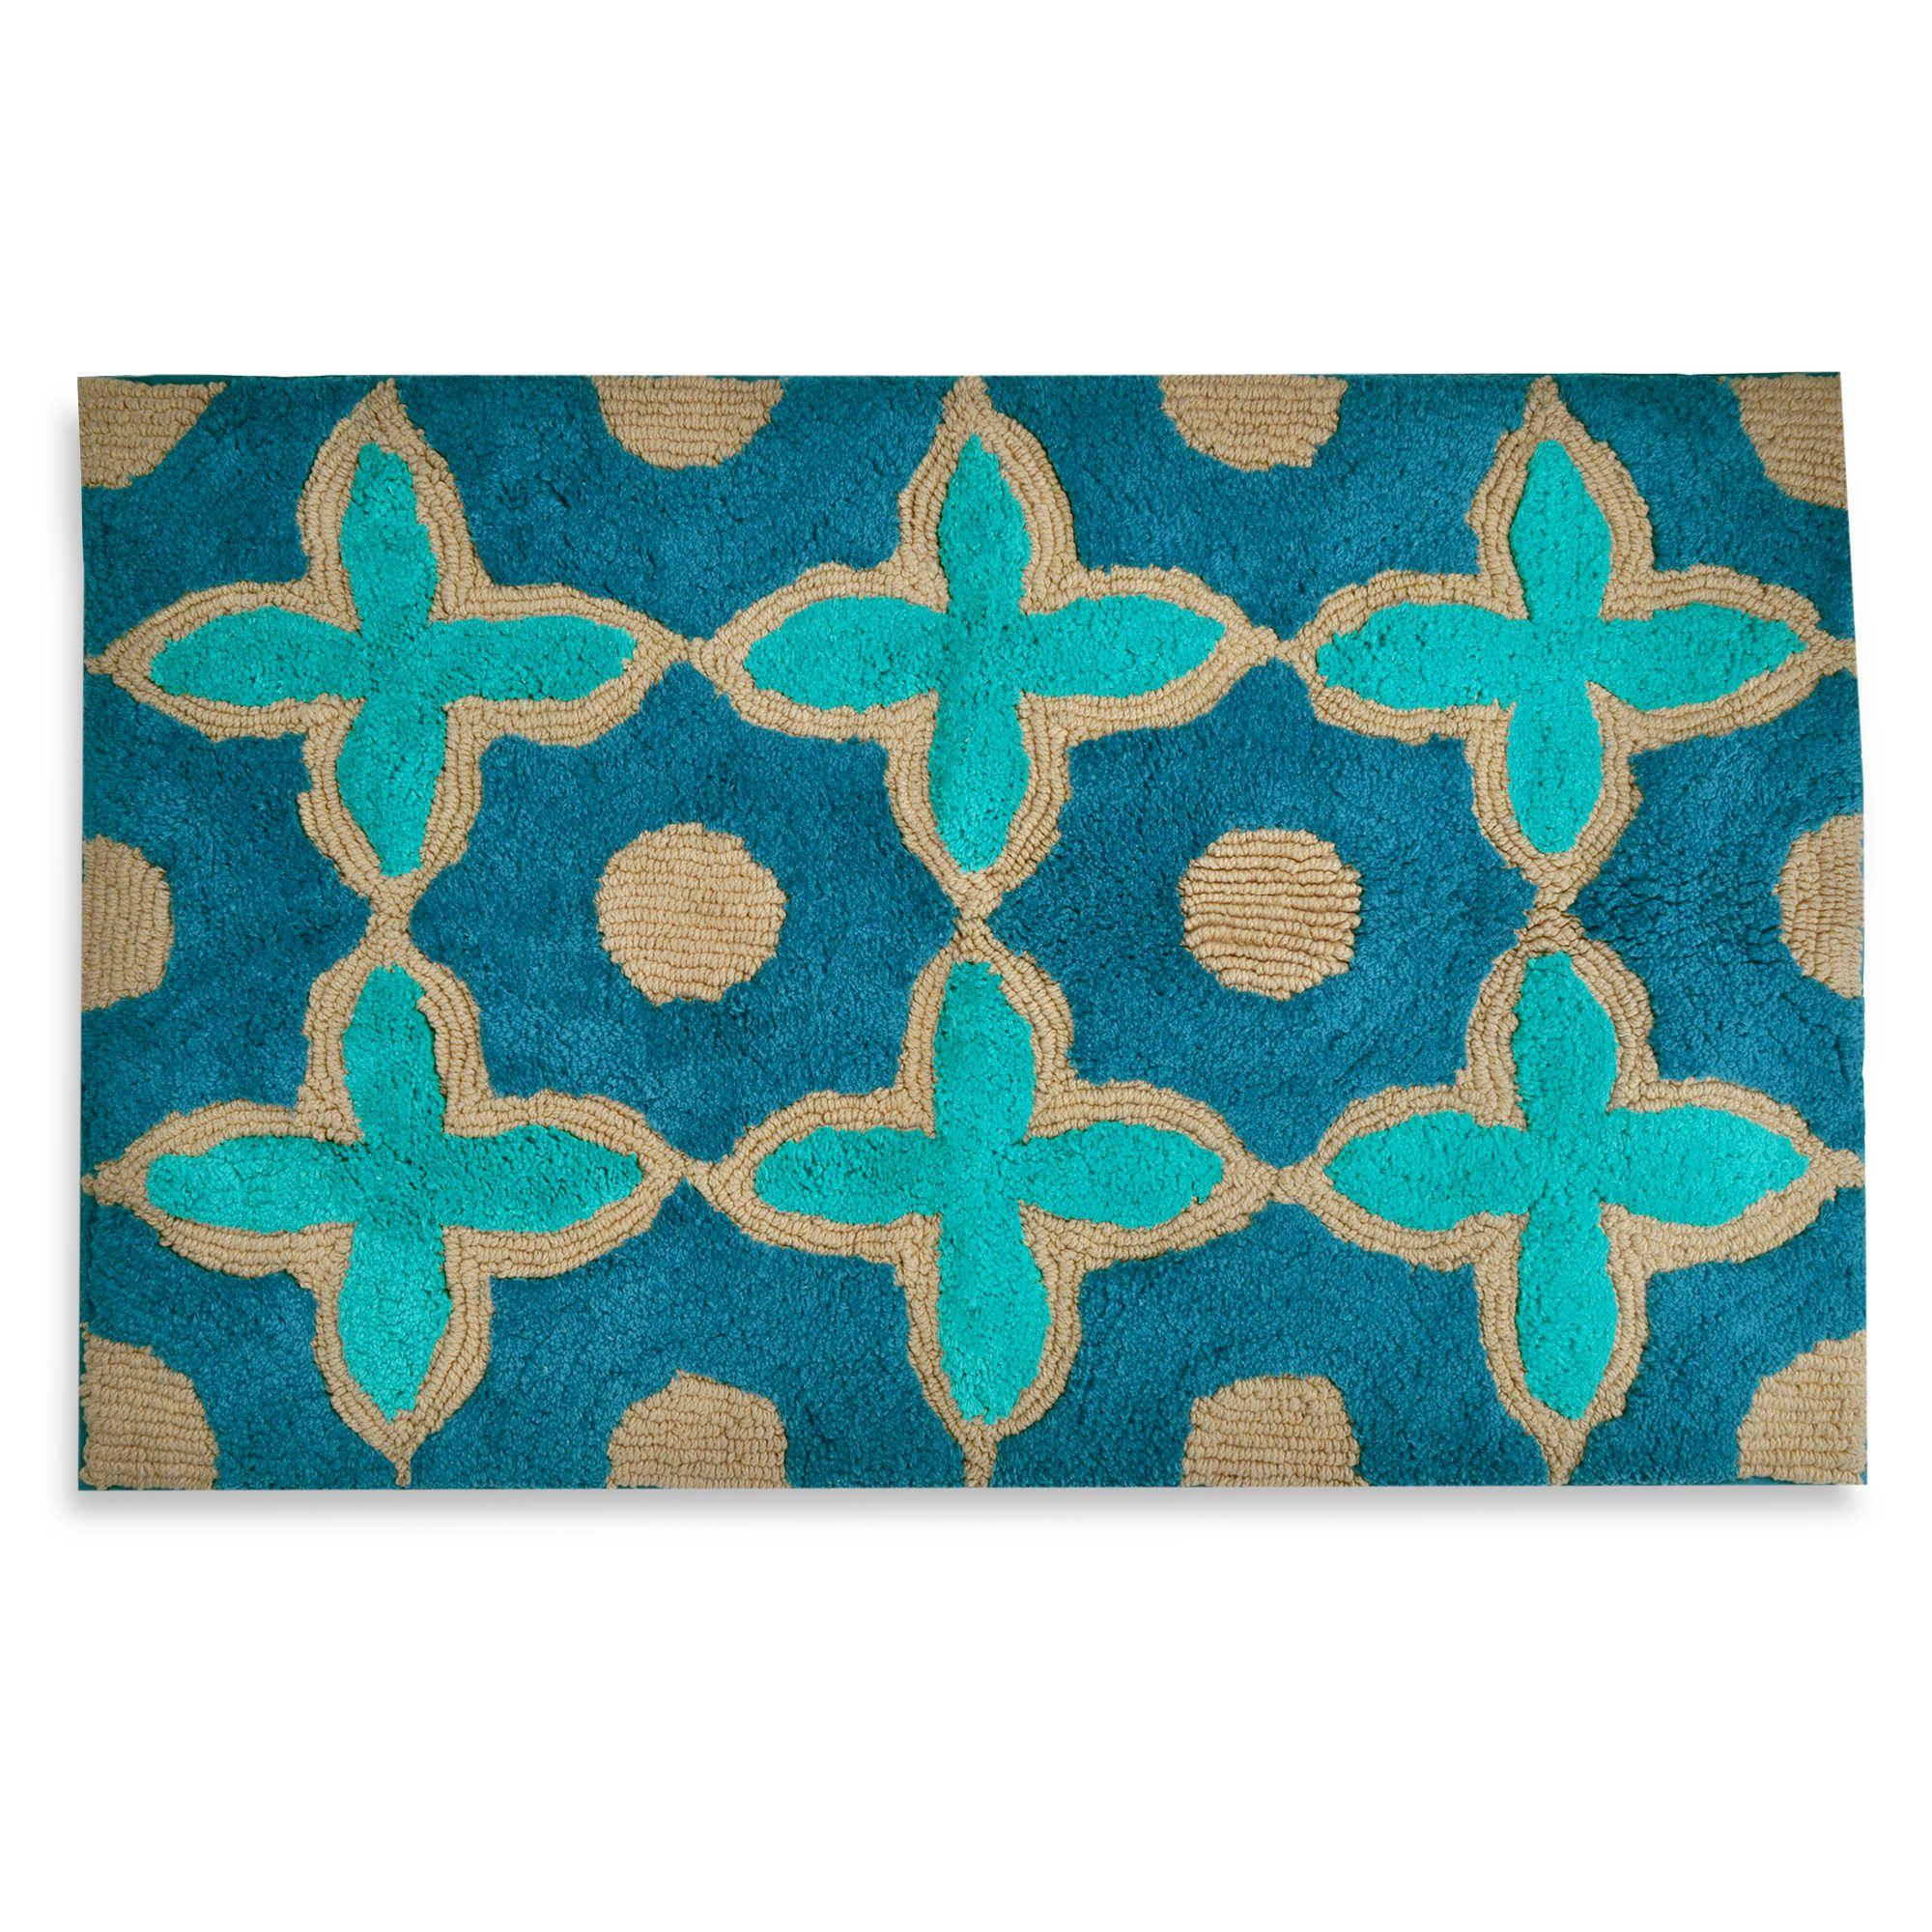 Matisse Shower Curtain Global Homewares Pinterest Bath Rugs - Taupe bath rug for bathroom decorating ideas